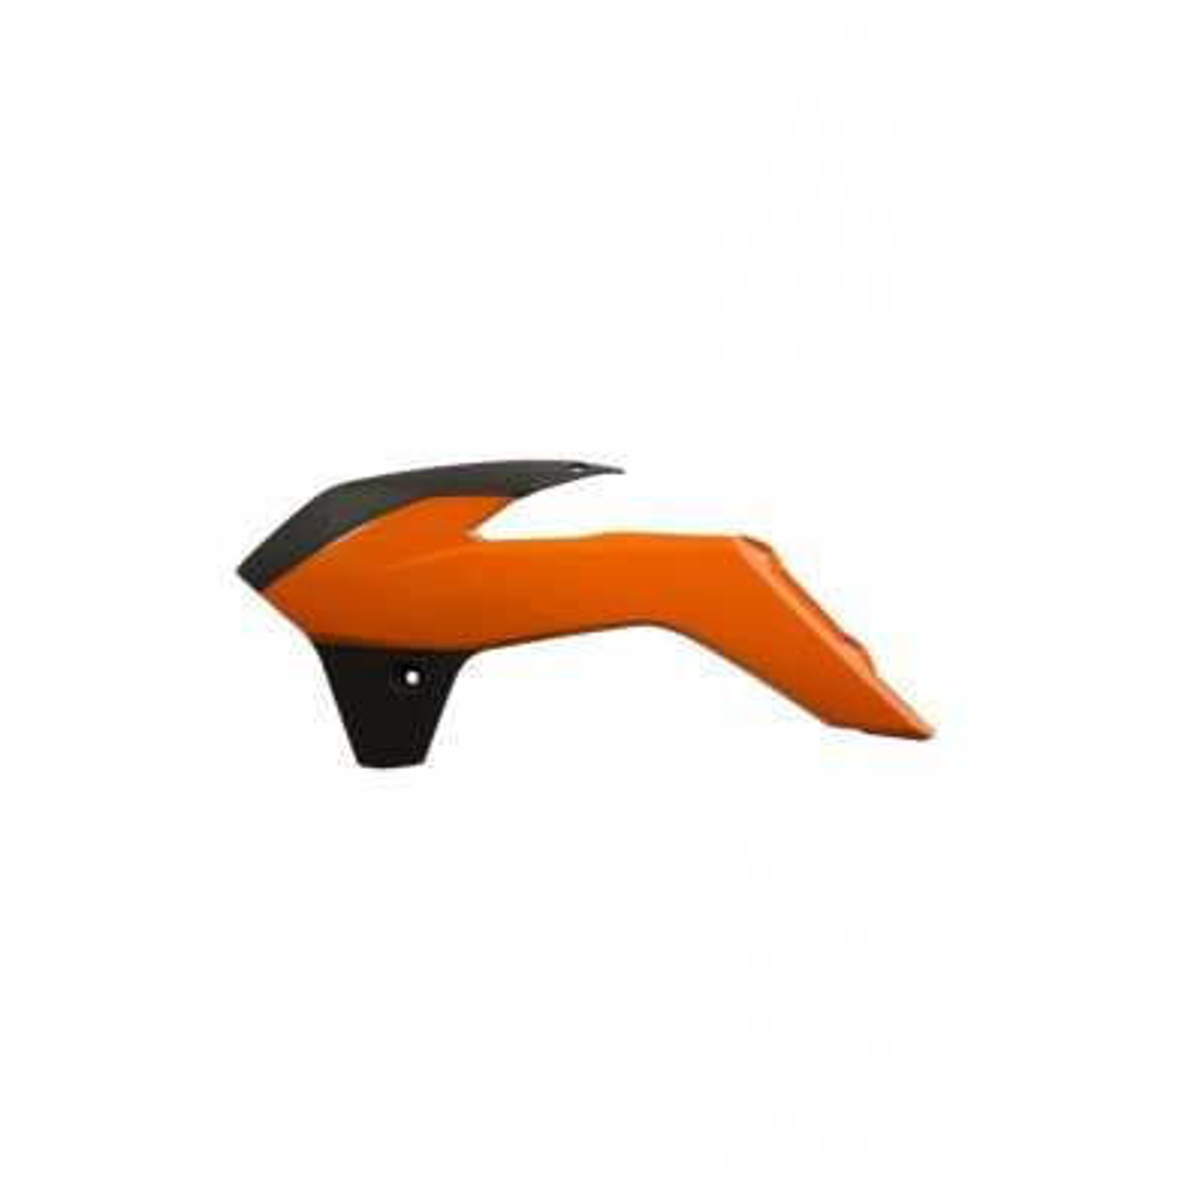 0016896-016 - Tapa Radiador Ktm Sx85 13 17 Naranja Negro